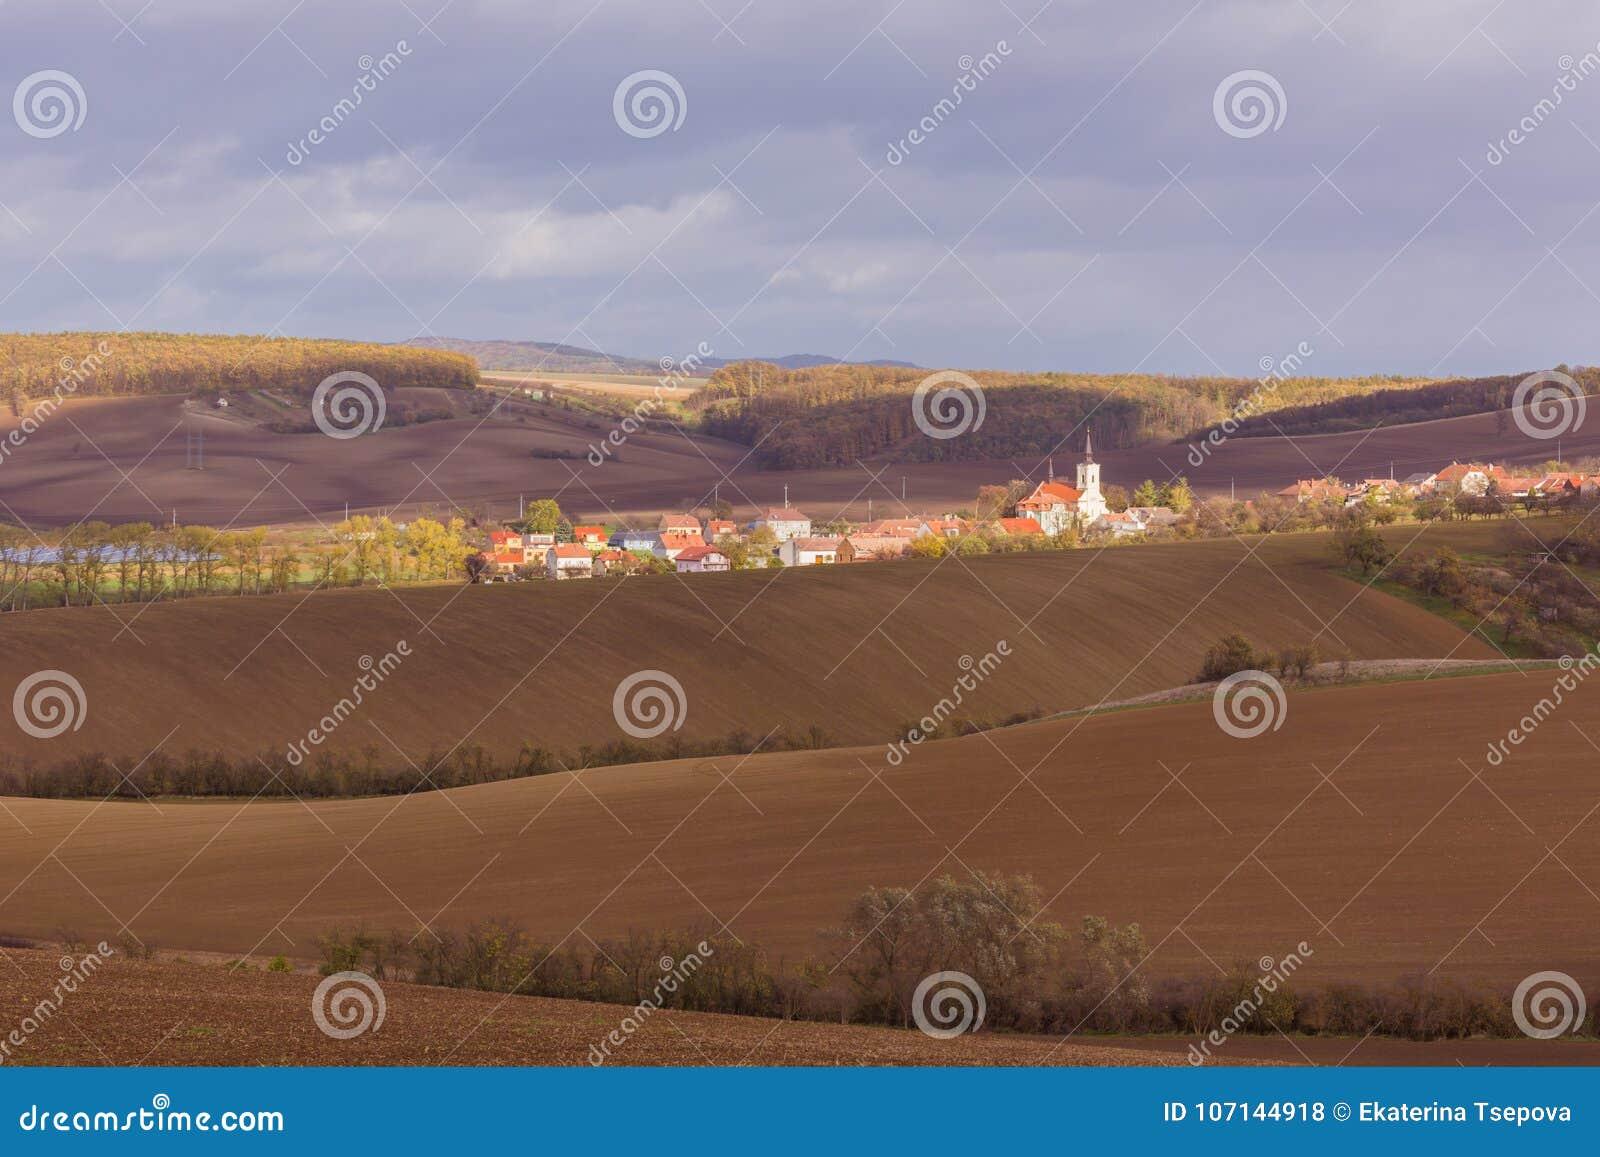 Autumn in Moravia